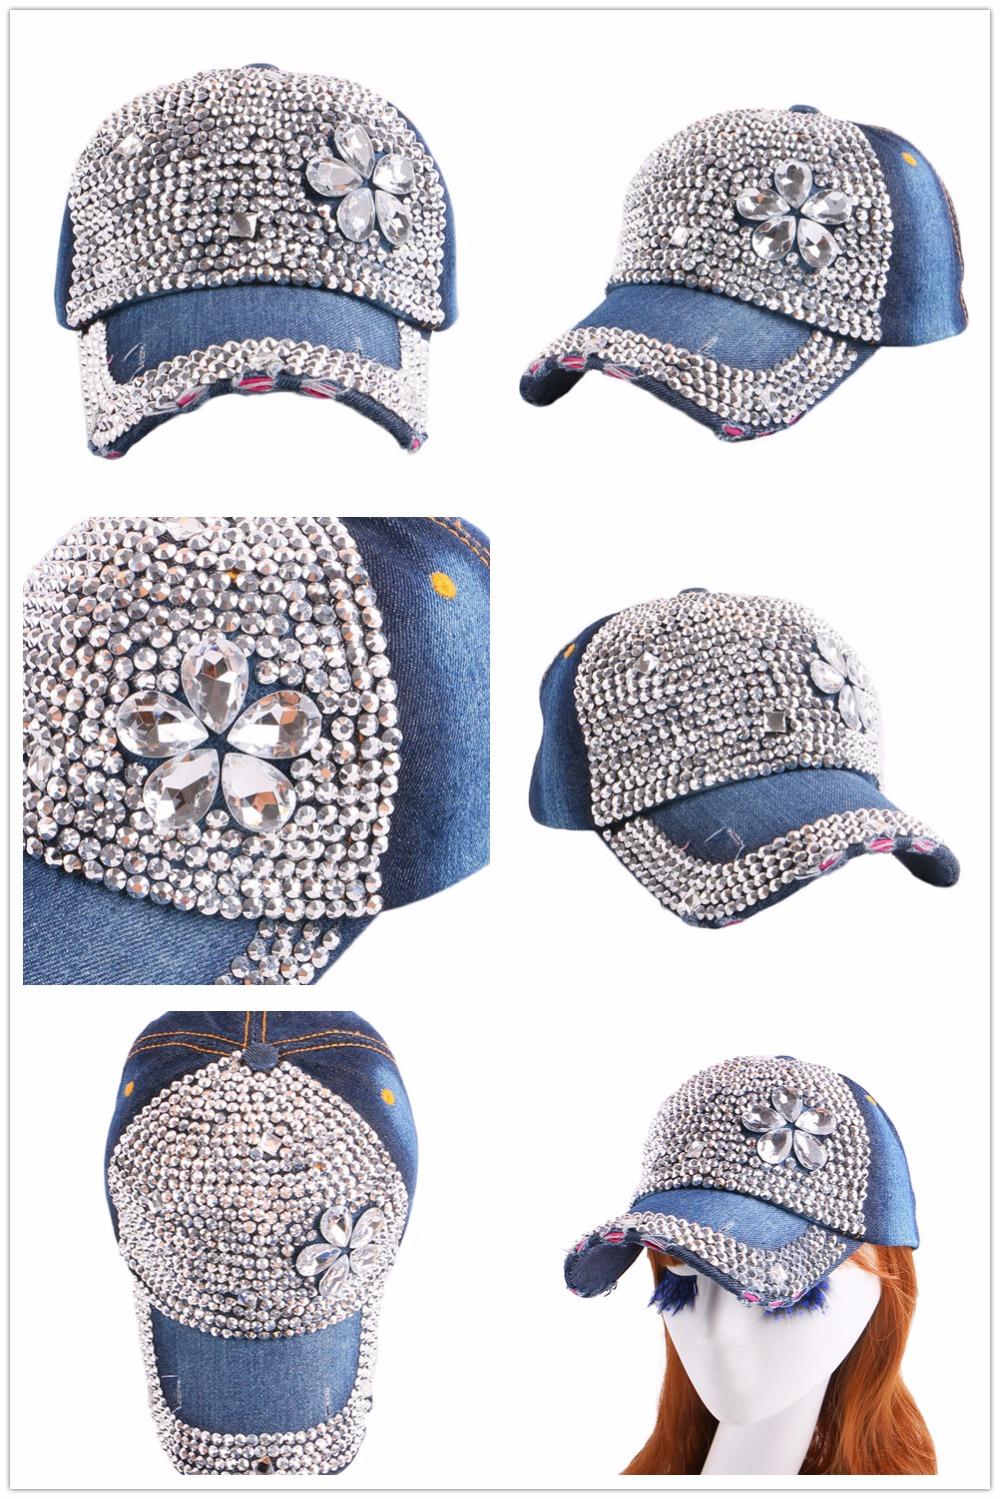 High Quality WOMEN brand baseball cap new fashion rhinestone crystal denim snapback caps wholesale woman hip hop snapbacks hats 14